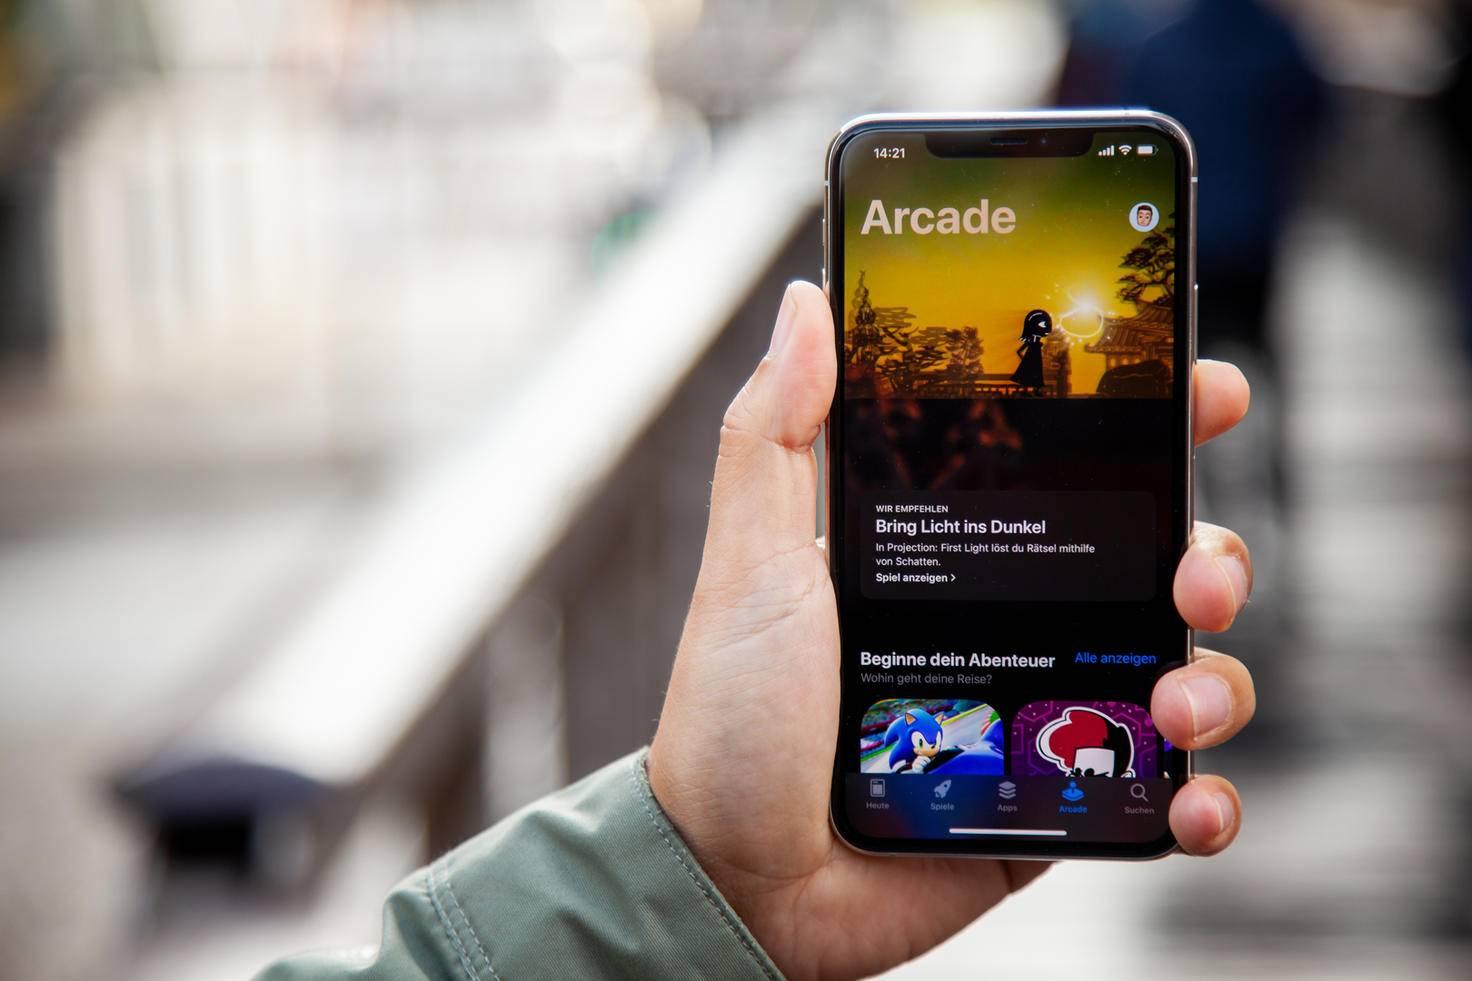 iphone-11-pro-max-apple-arcade